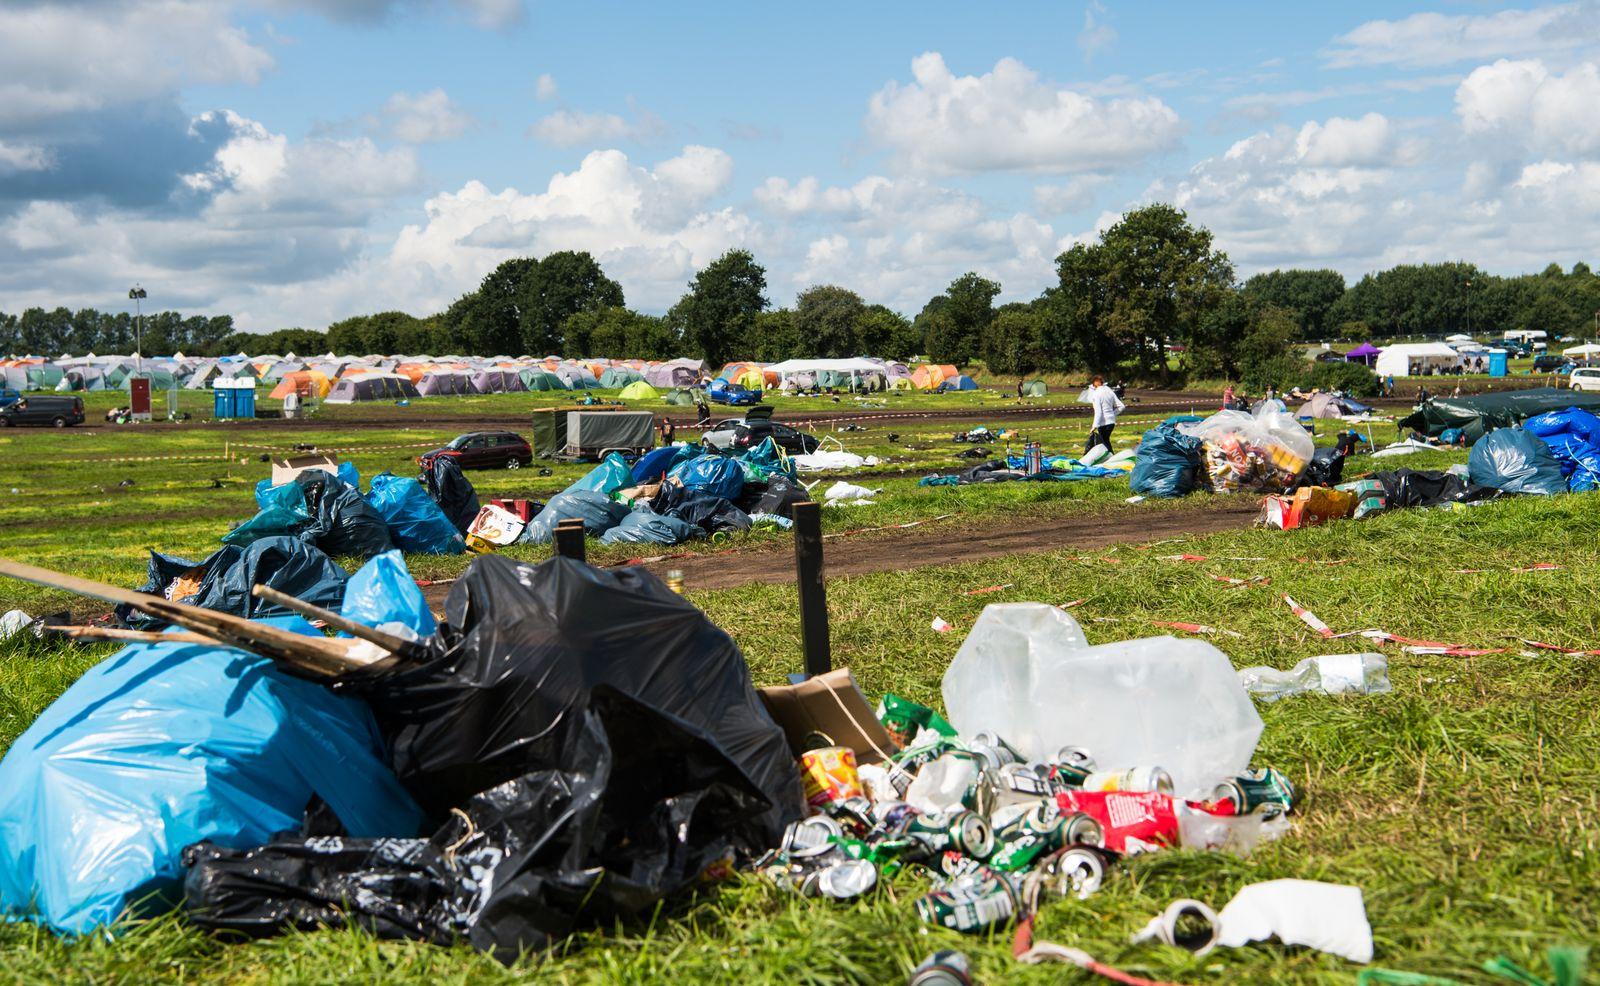 Festivalgelände / Müll